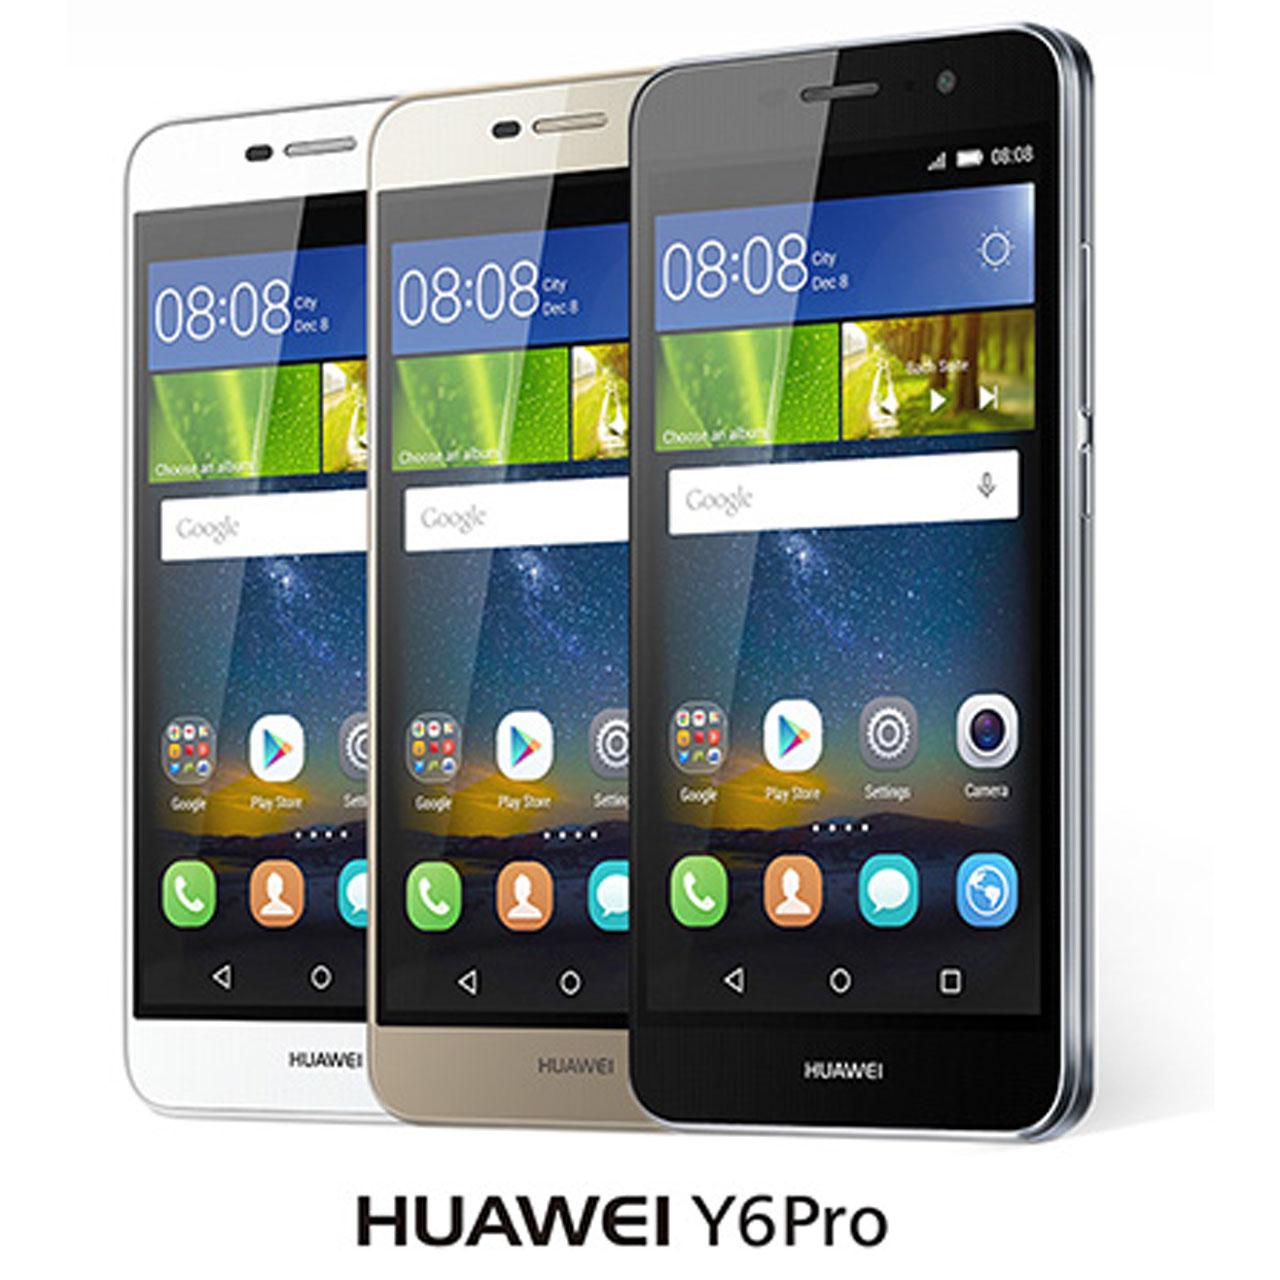 Huawei-Y6-Pro-Dual-SIM-Mobile-Phone-3